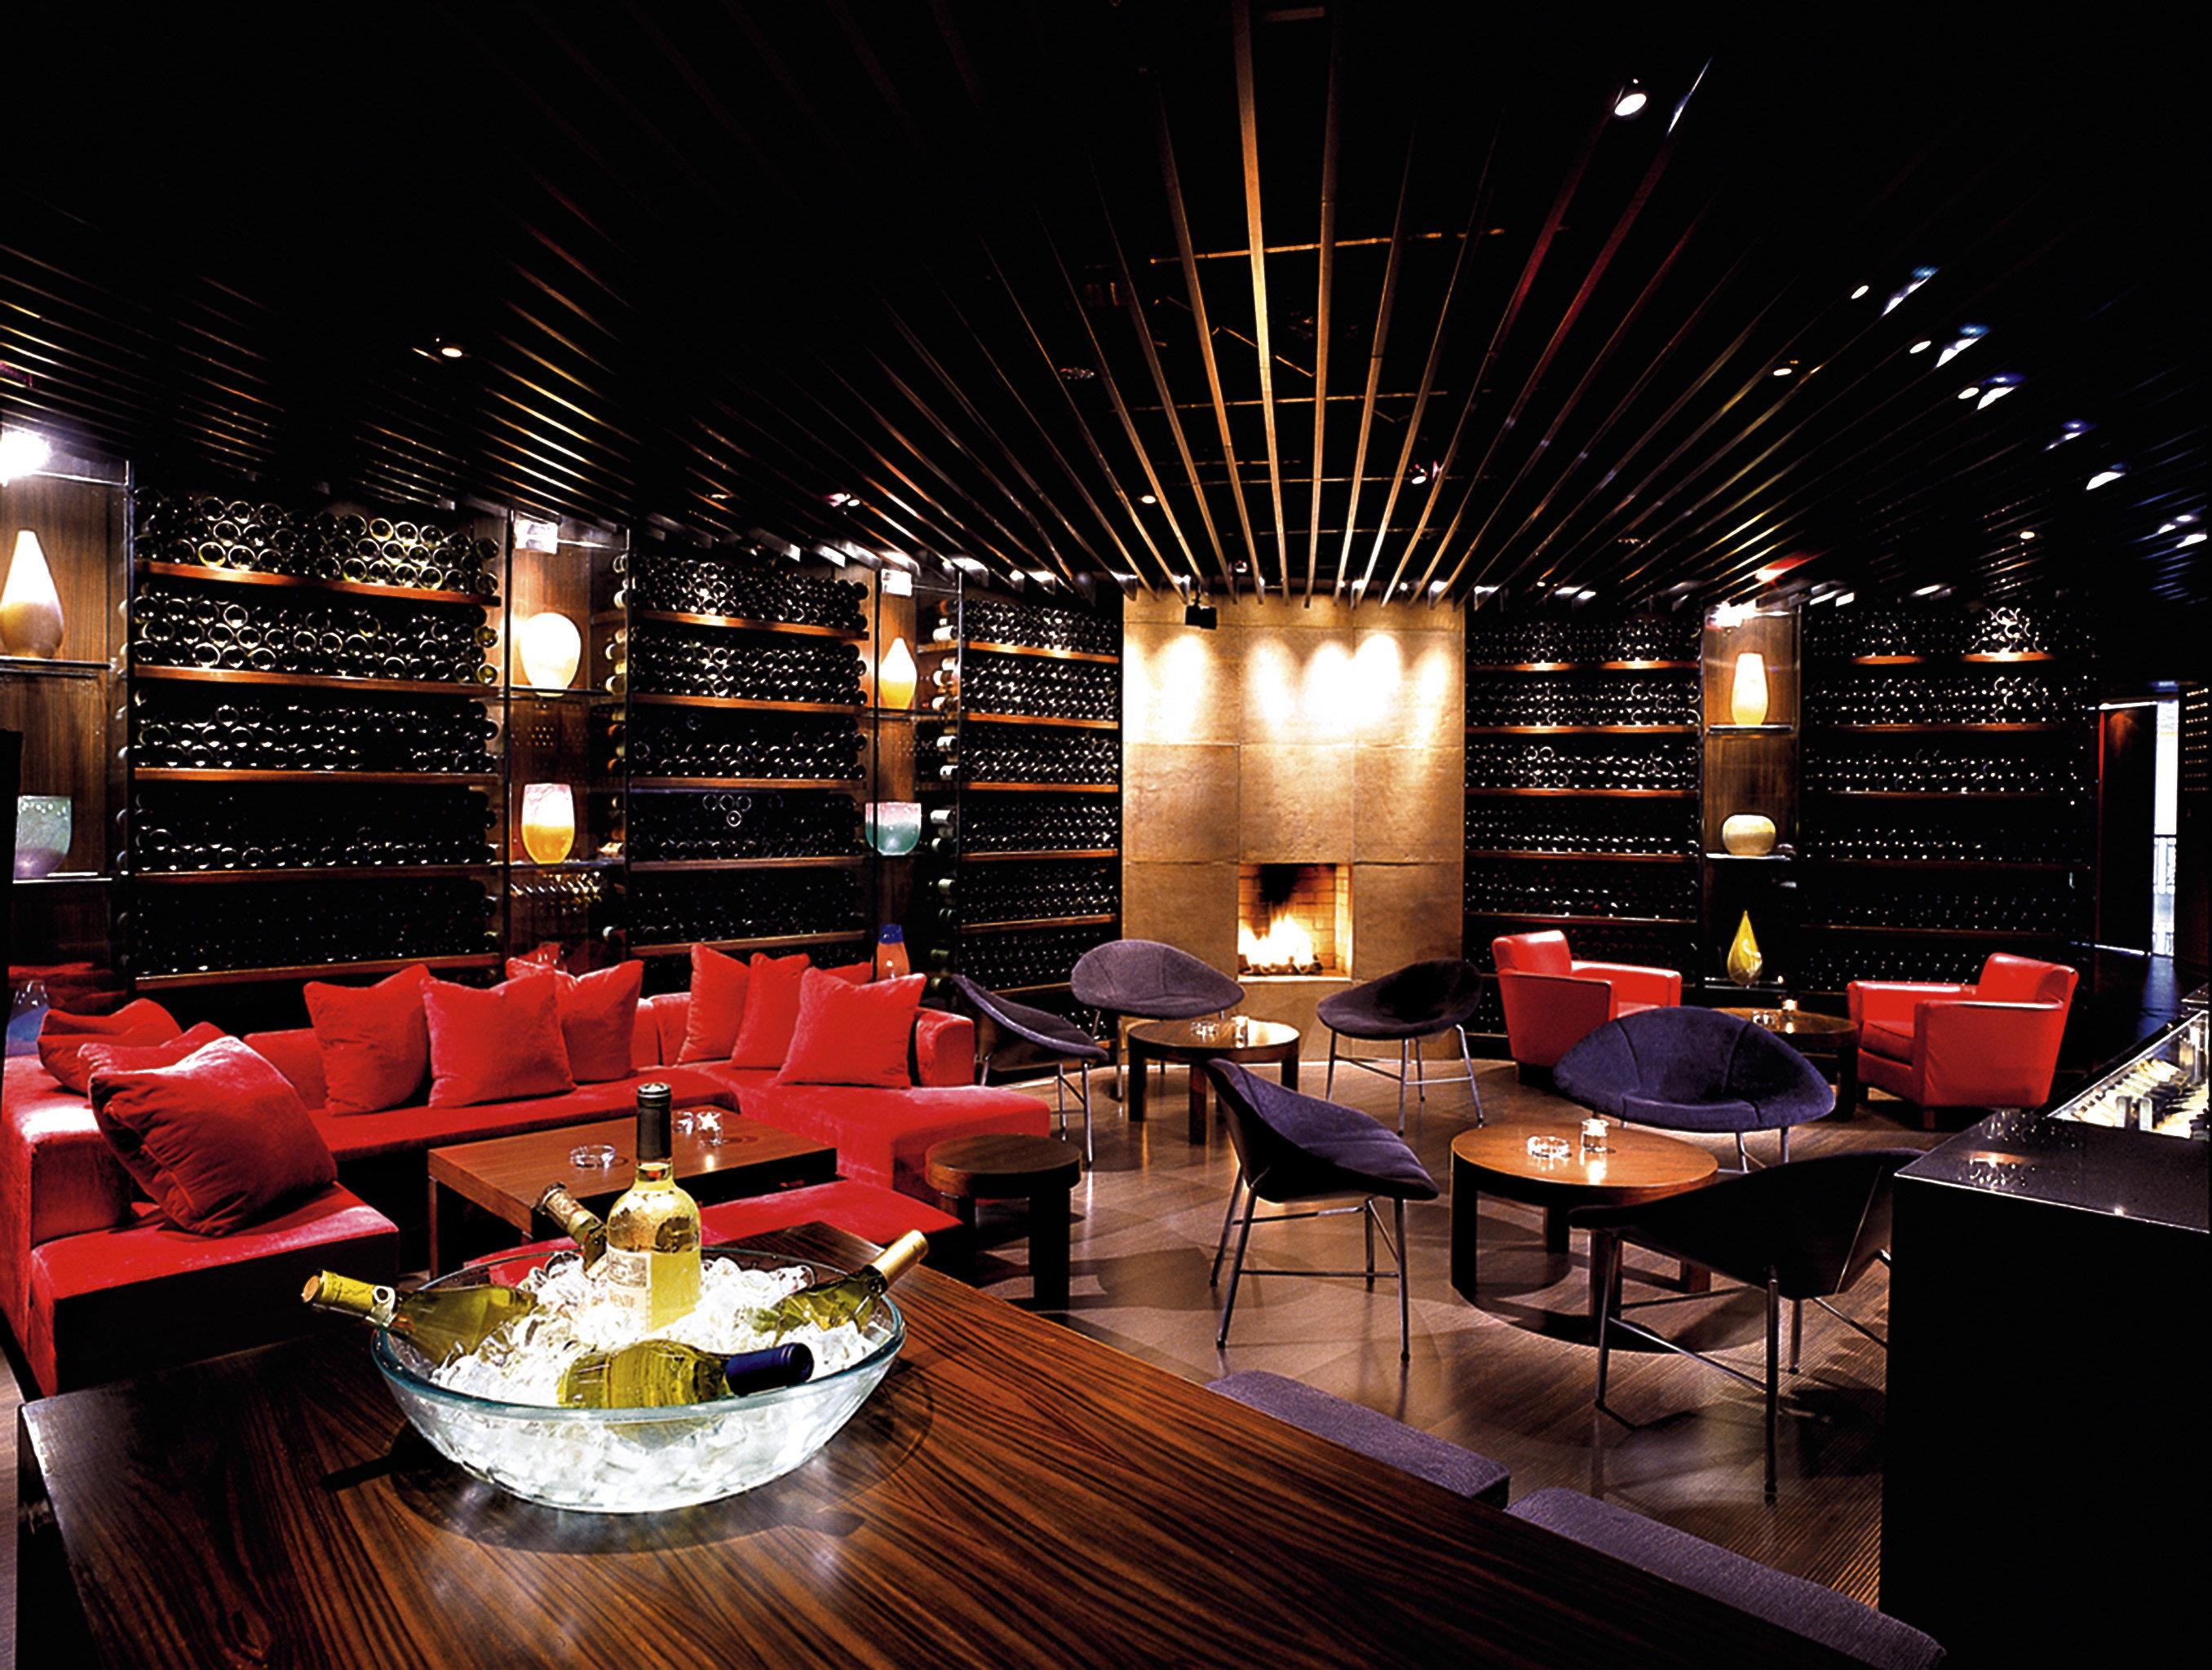 Bar City Dining Drink Eat Scenic views restaurant function hall nightclub